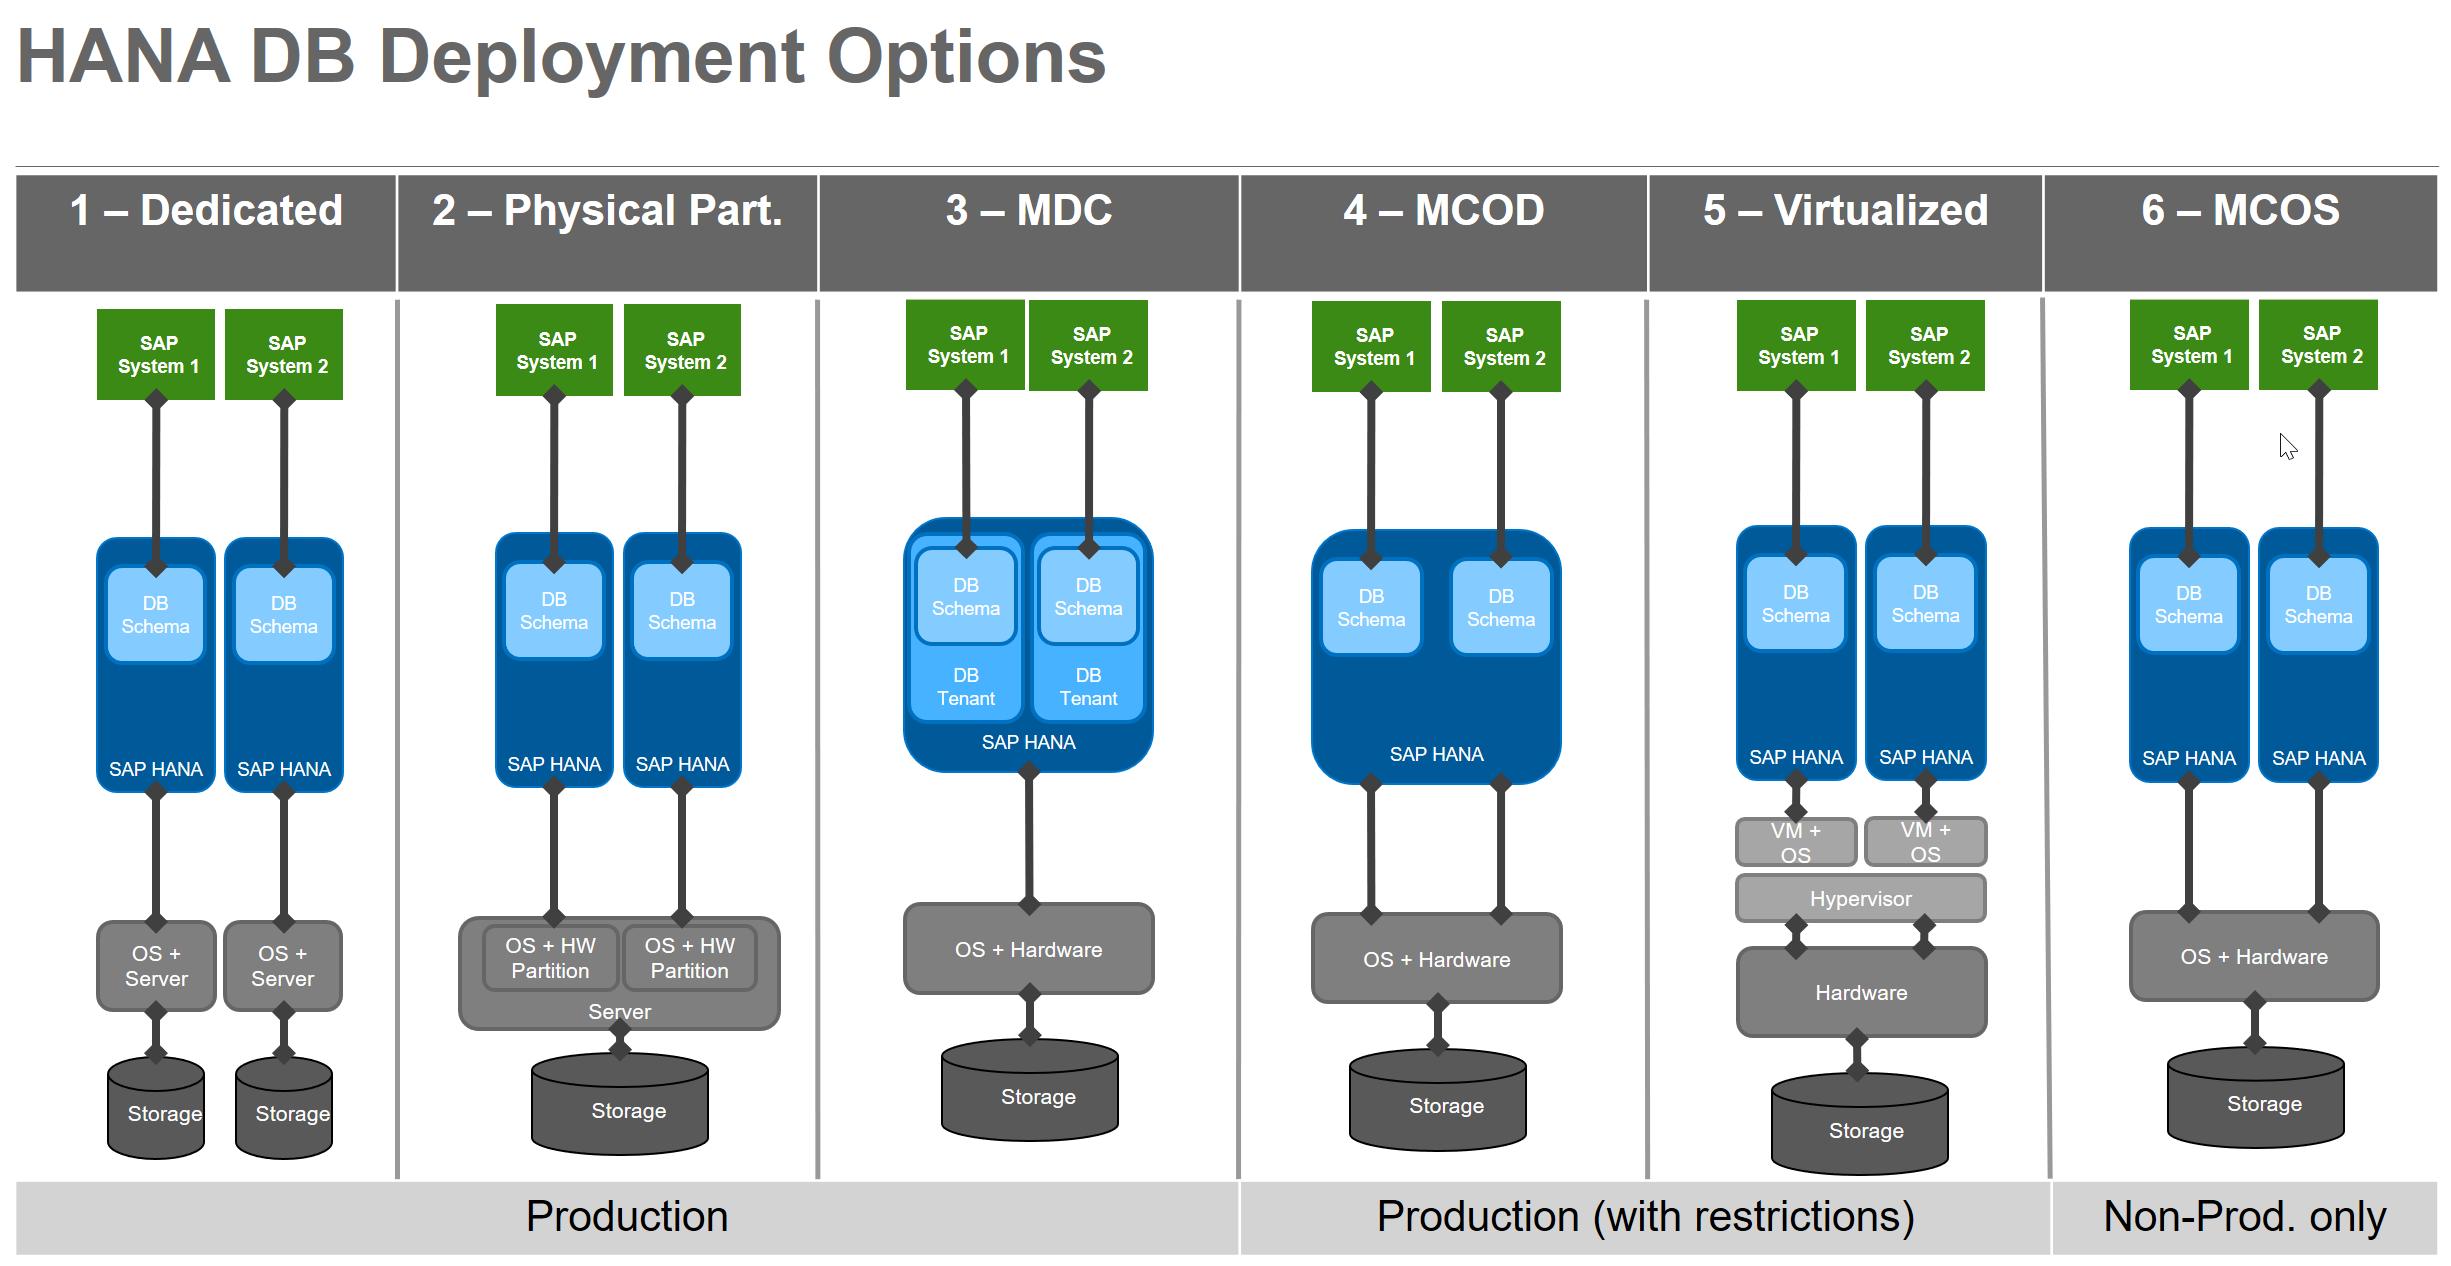 SAP HANA Managed System Setup for SAP Solution Manager 7 2